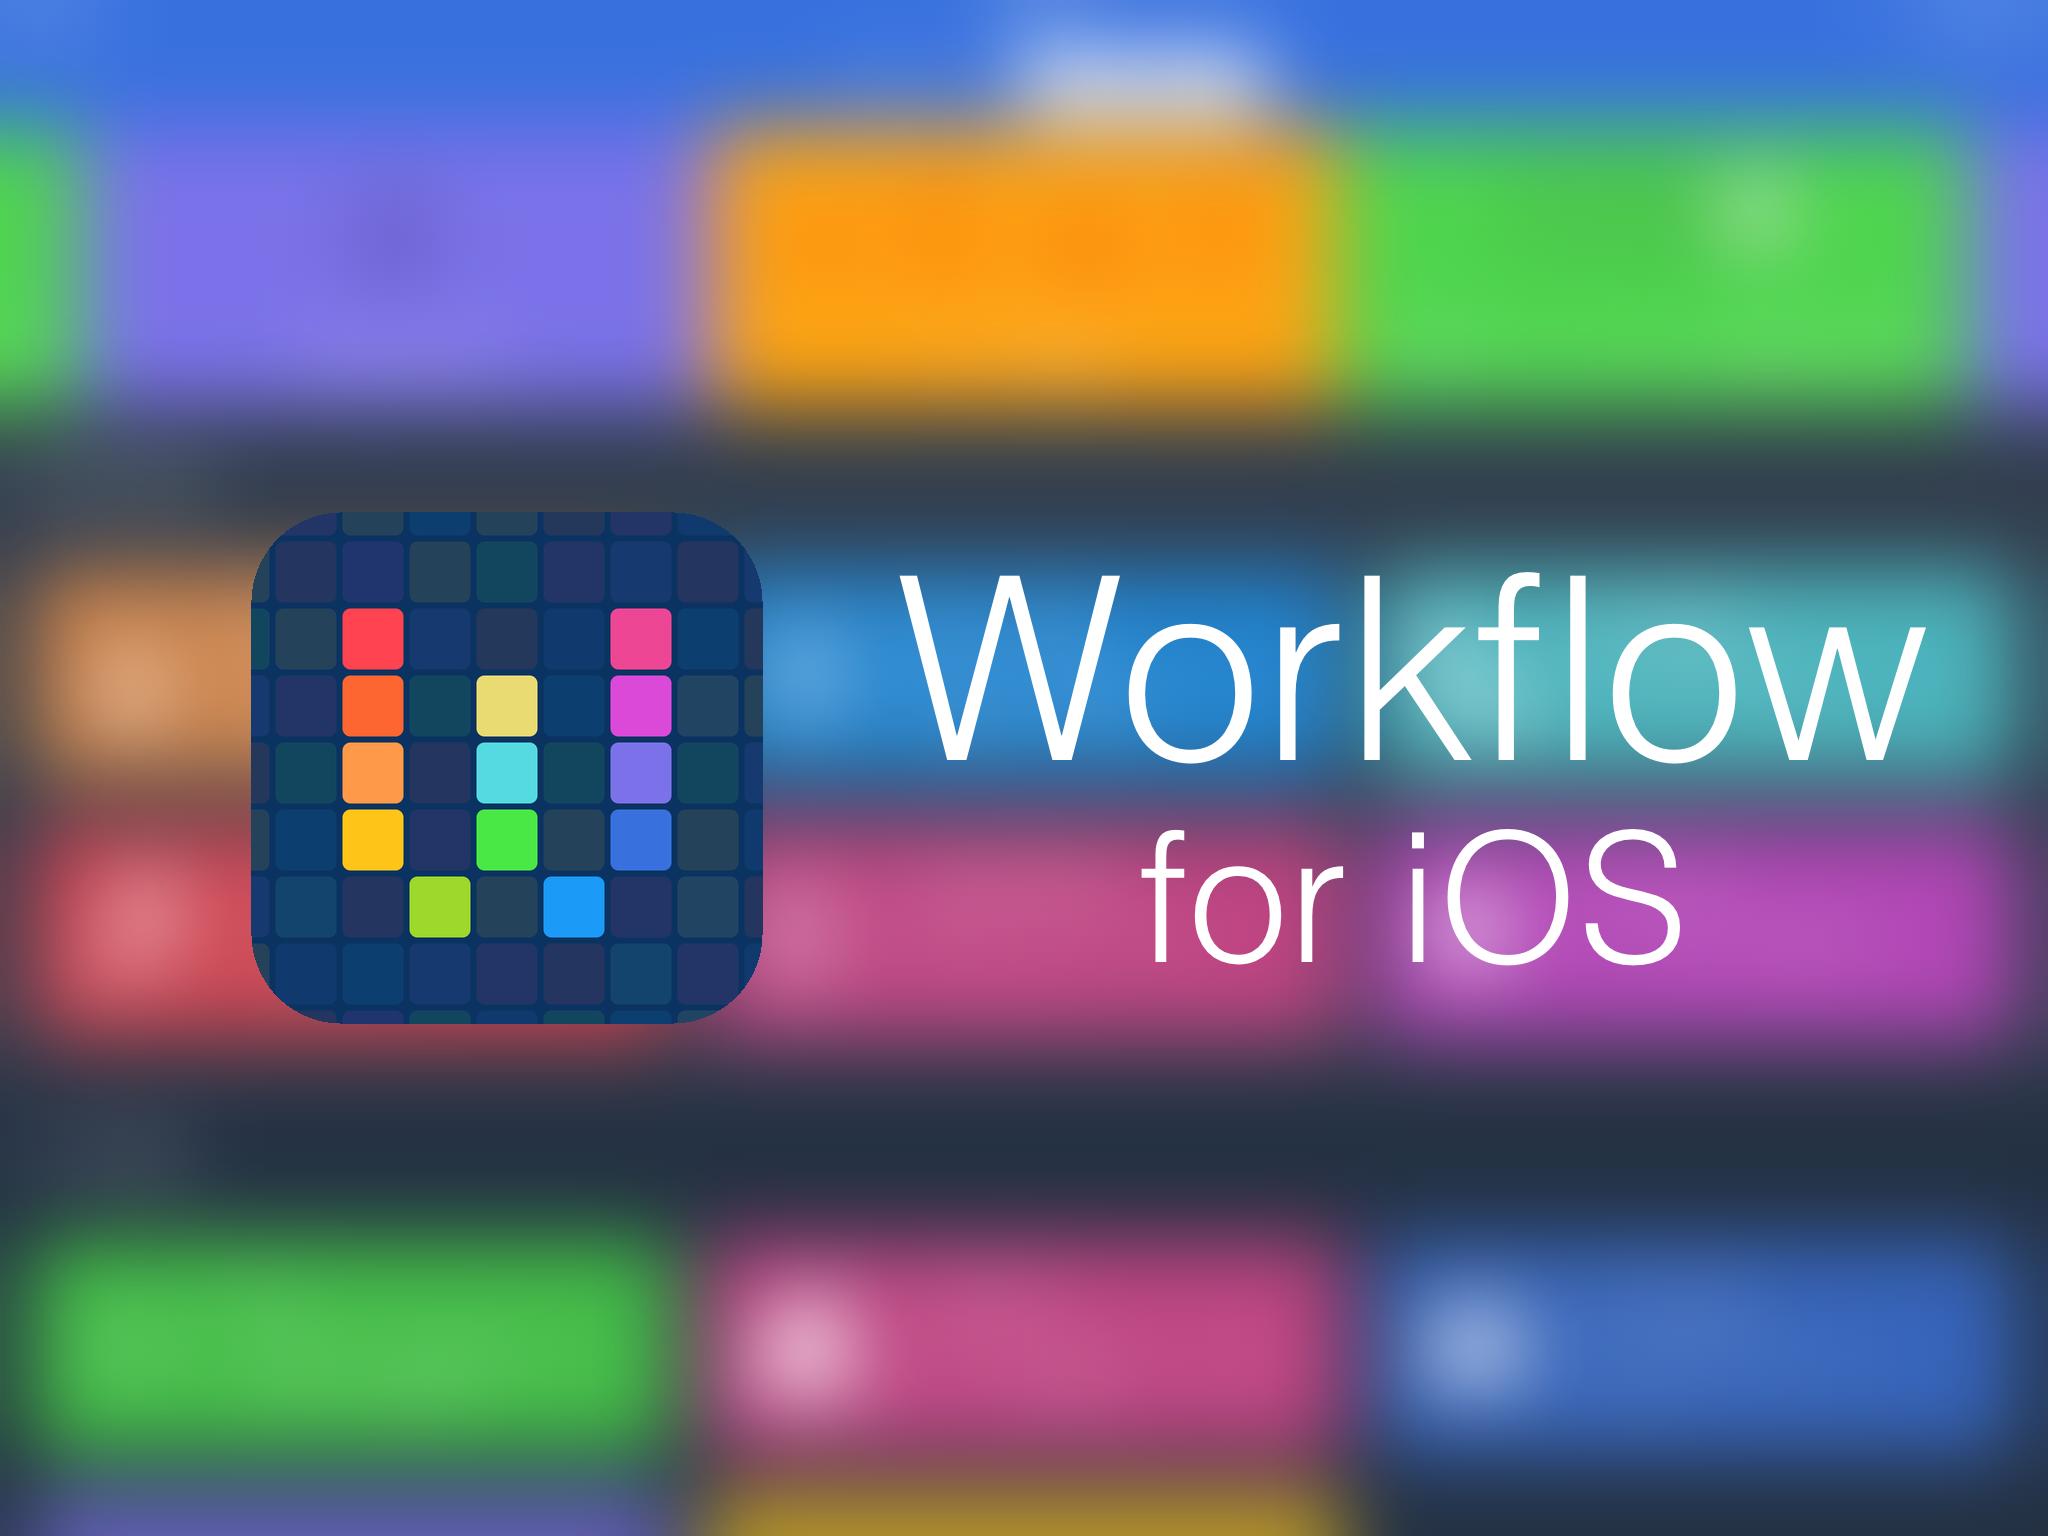 Workflow-app-banner